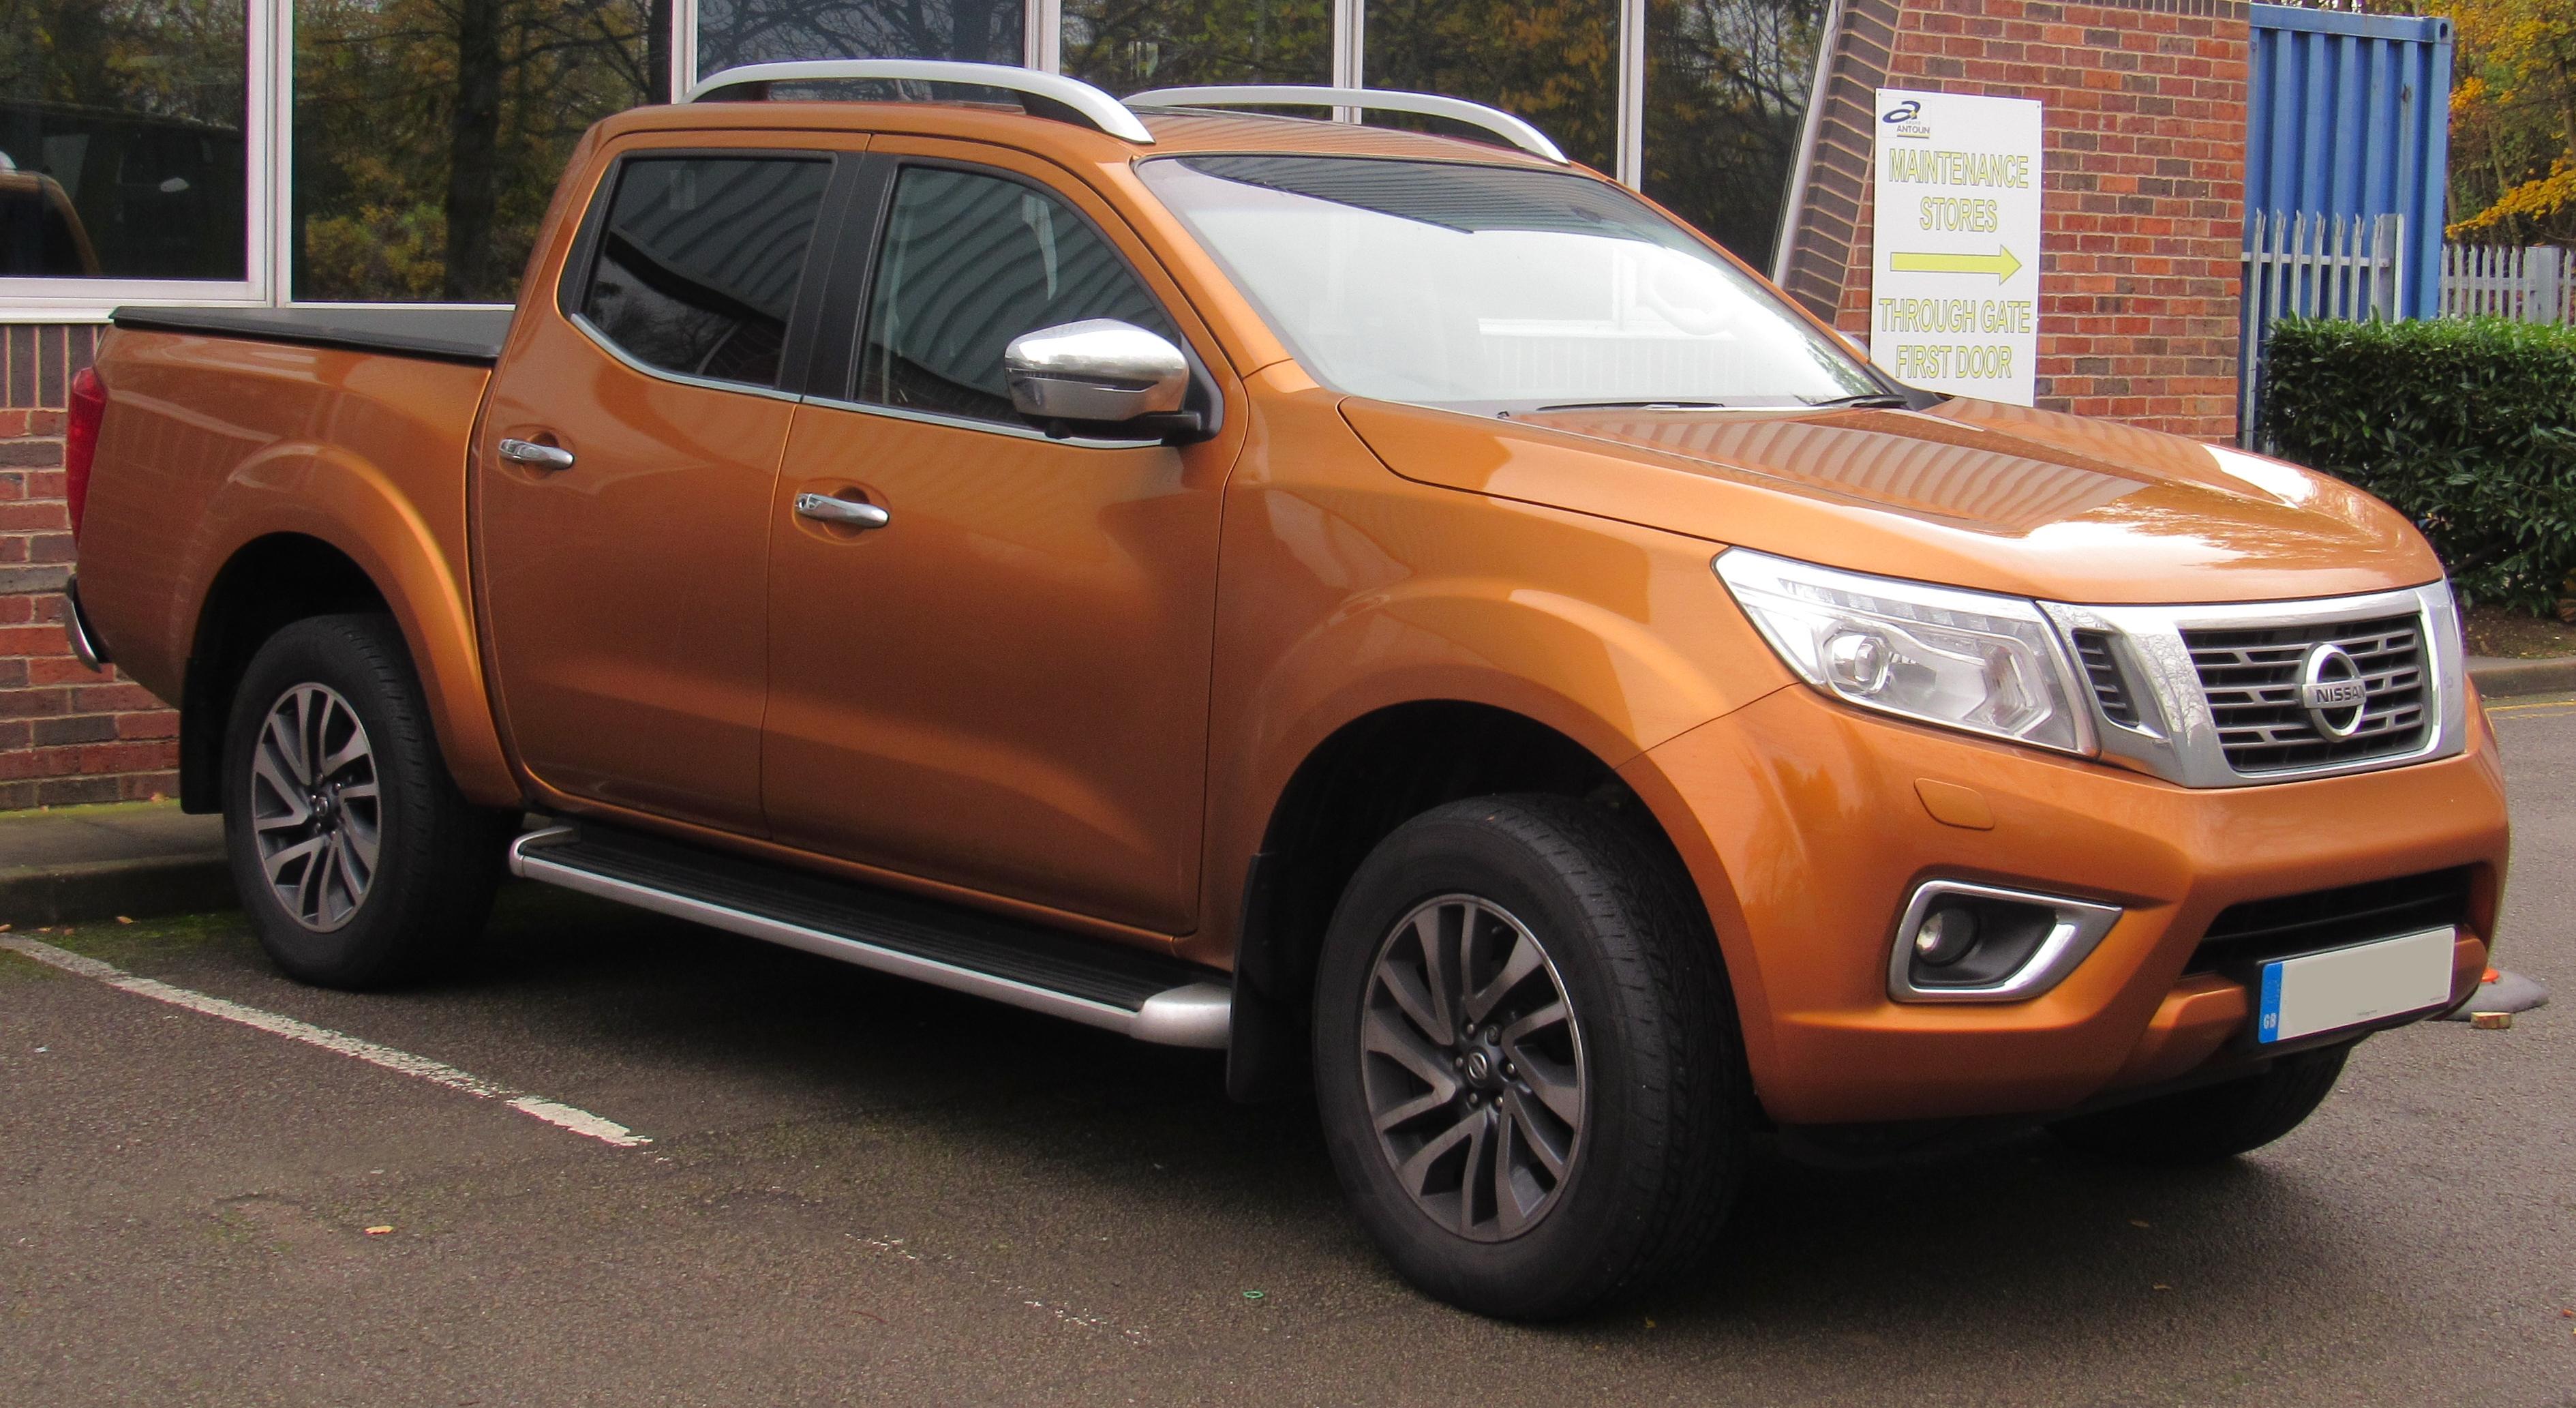 Nissan Navara (Frontier) IV (D23) 2014 - now Pickup ...